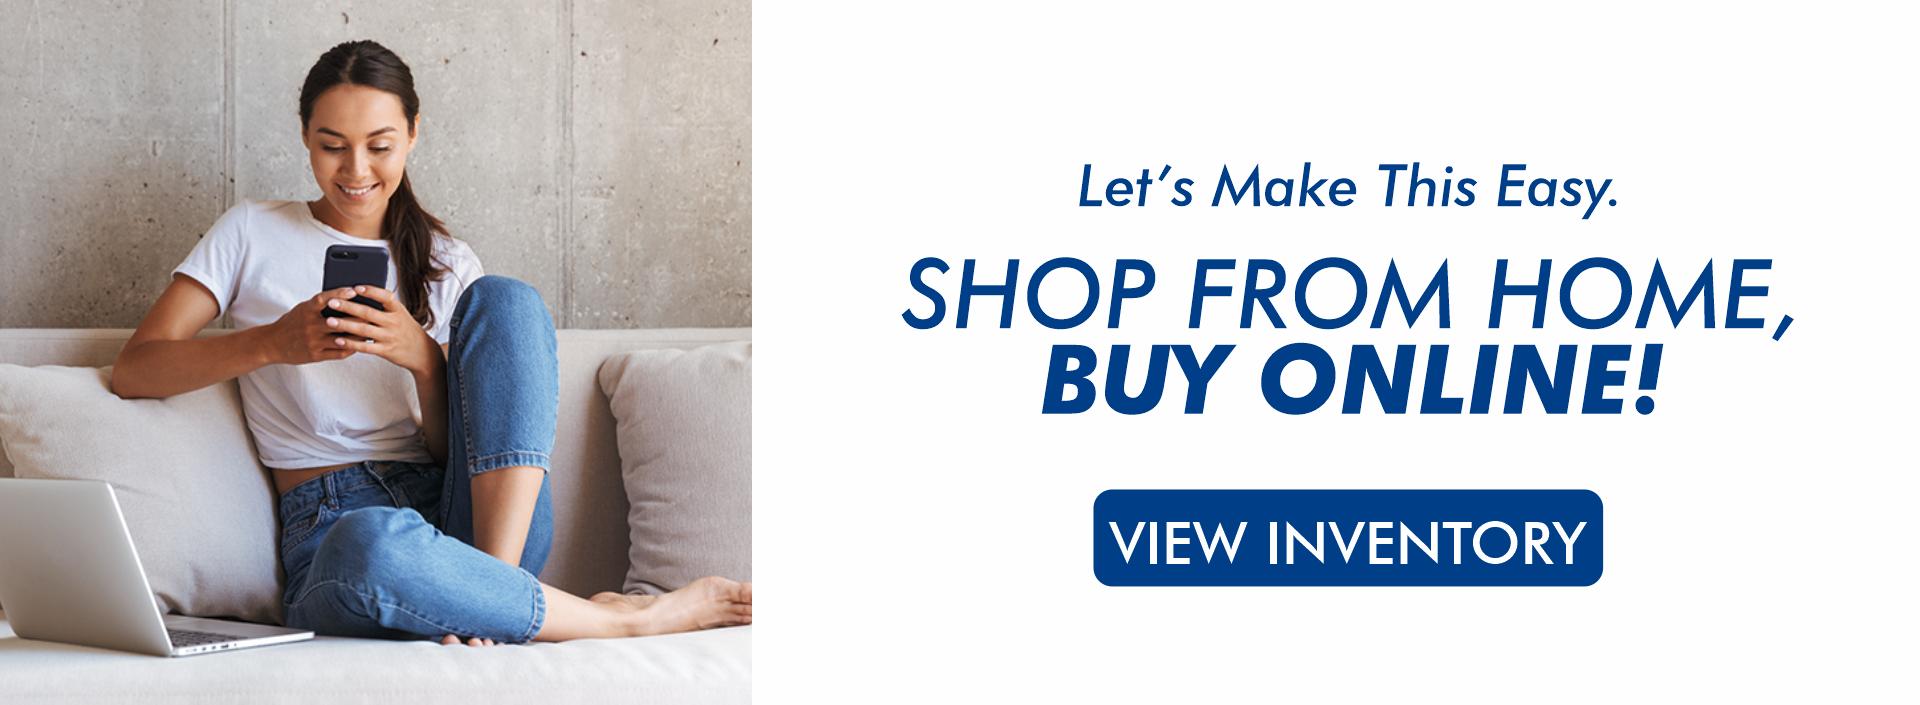 2021MarBanners-Shopfromhome